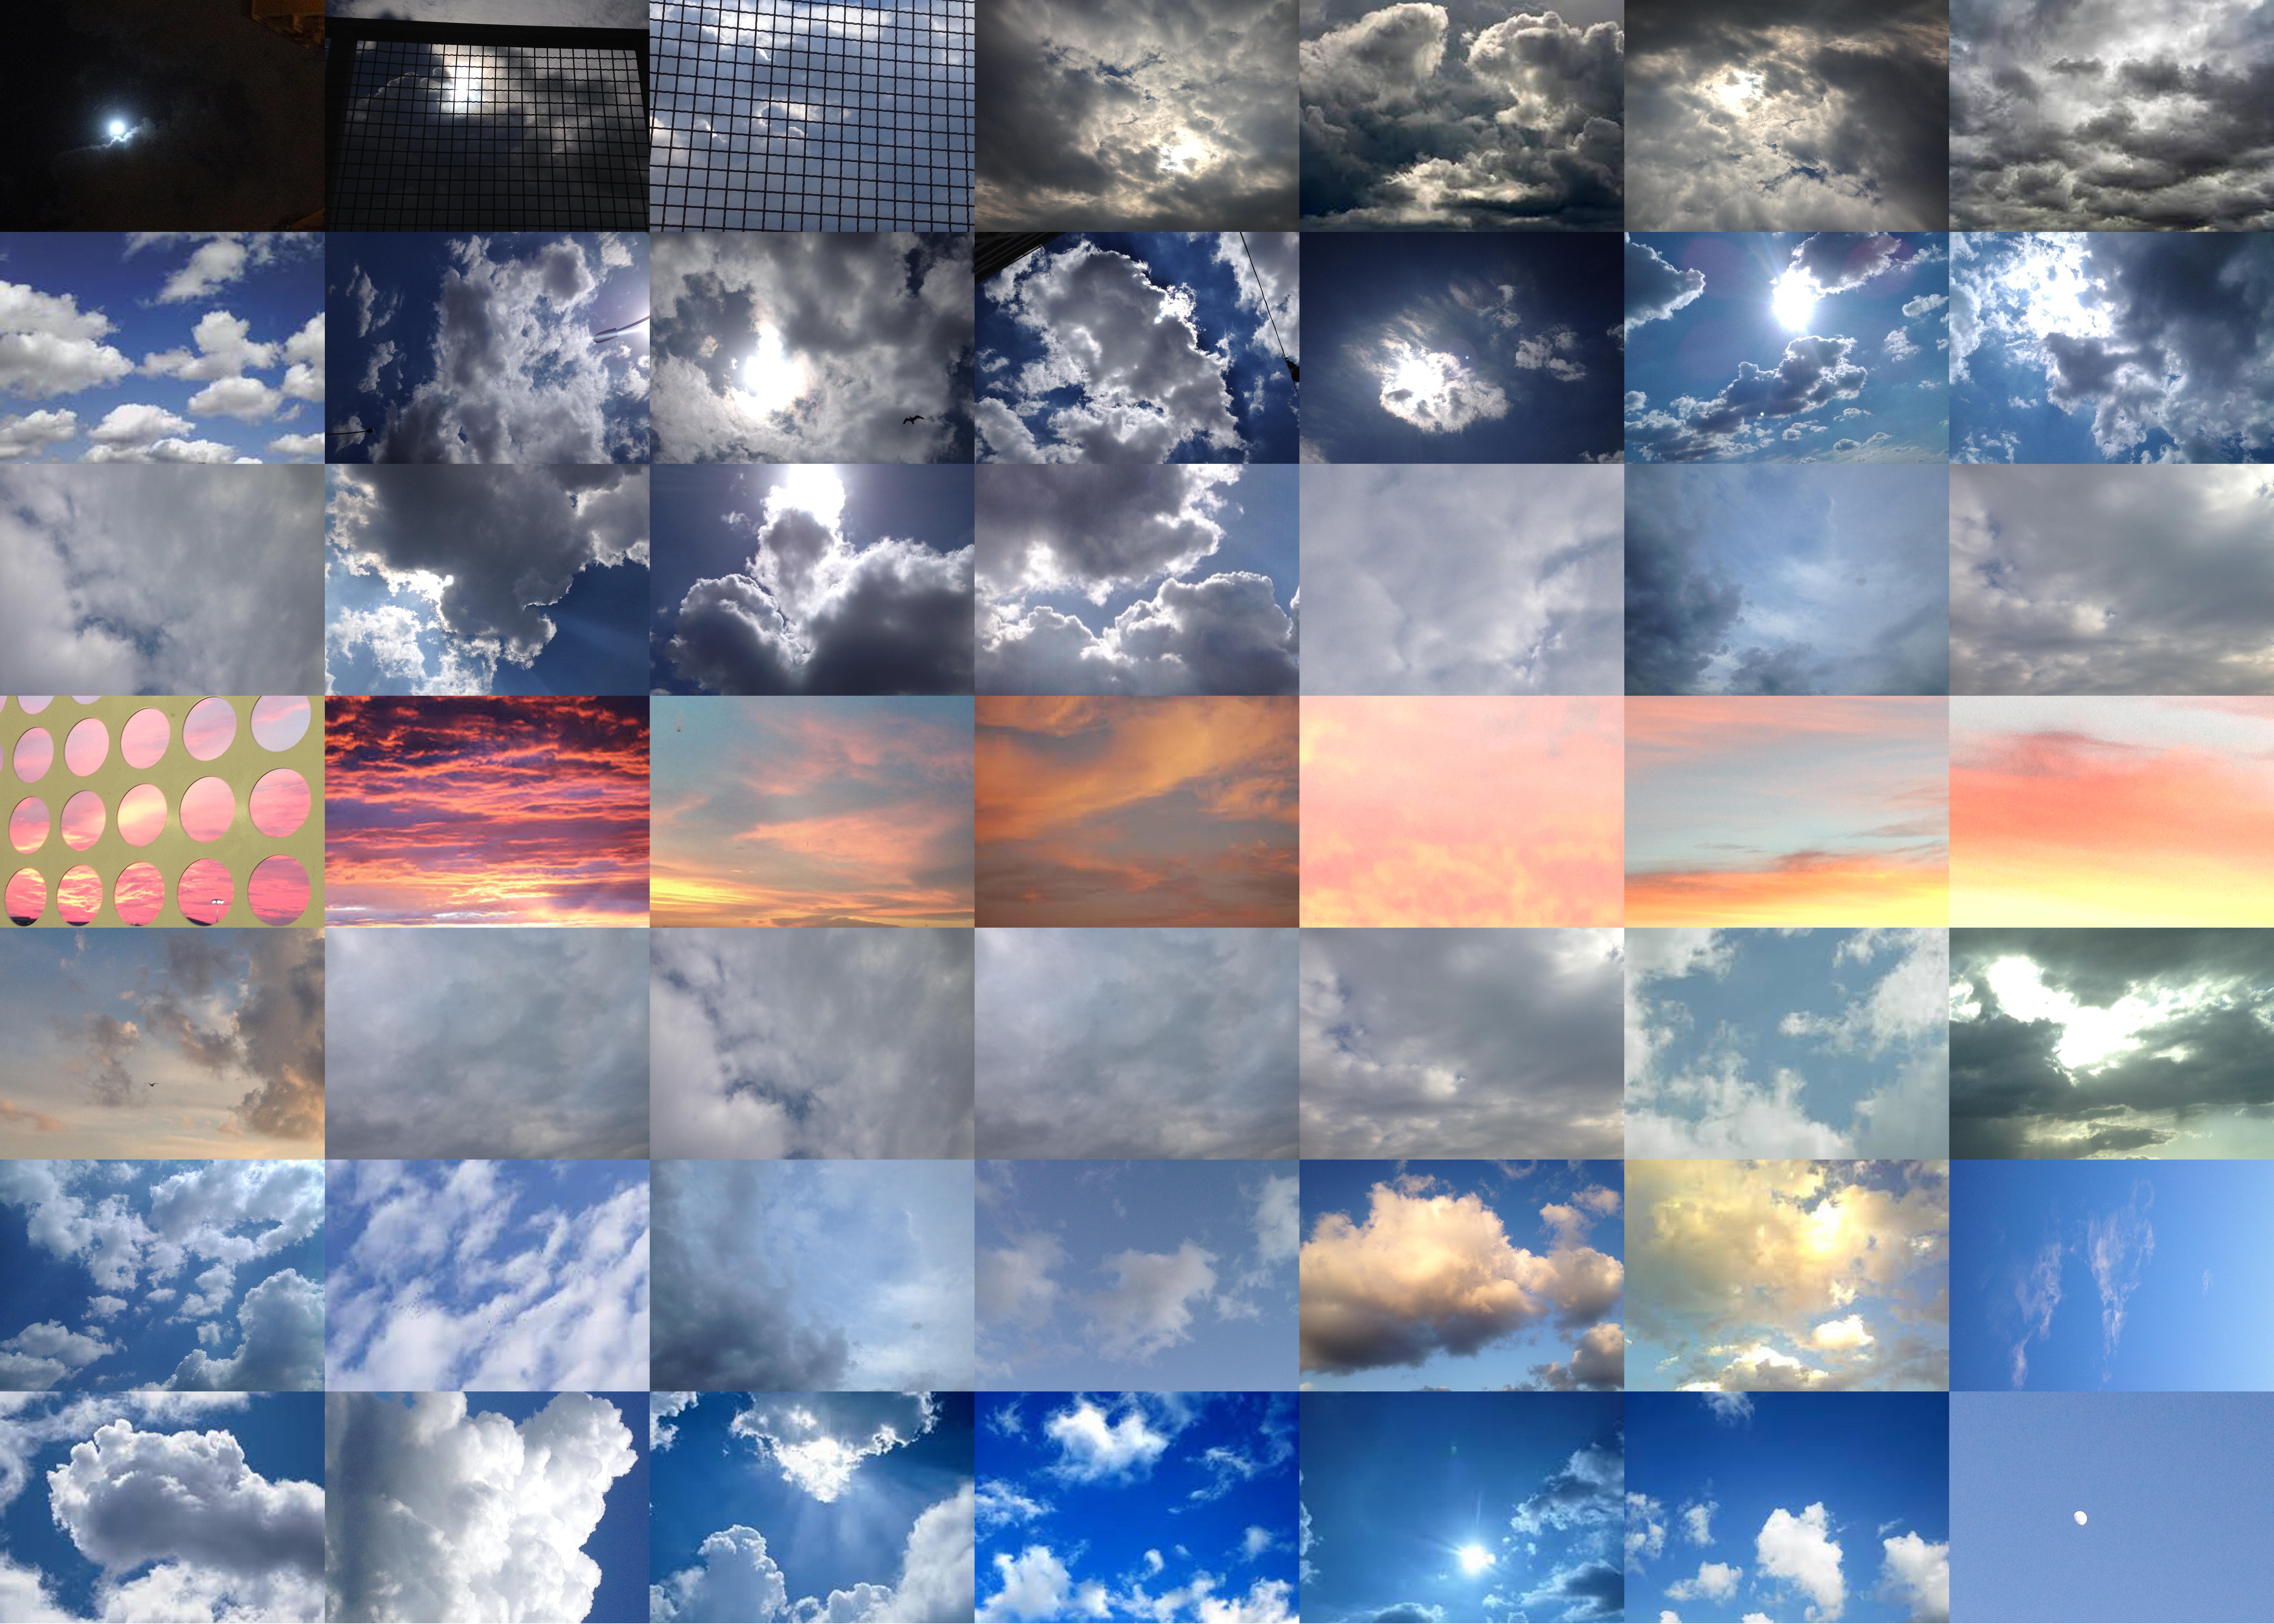 Cristiana Mazzoni, Nuvole e cielo